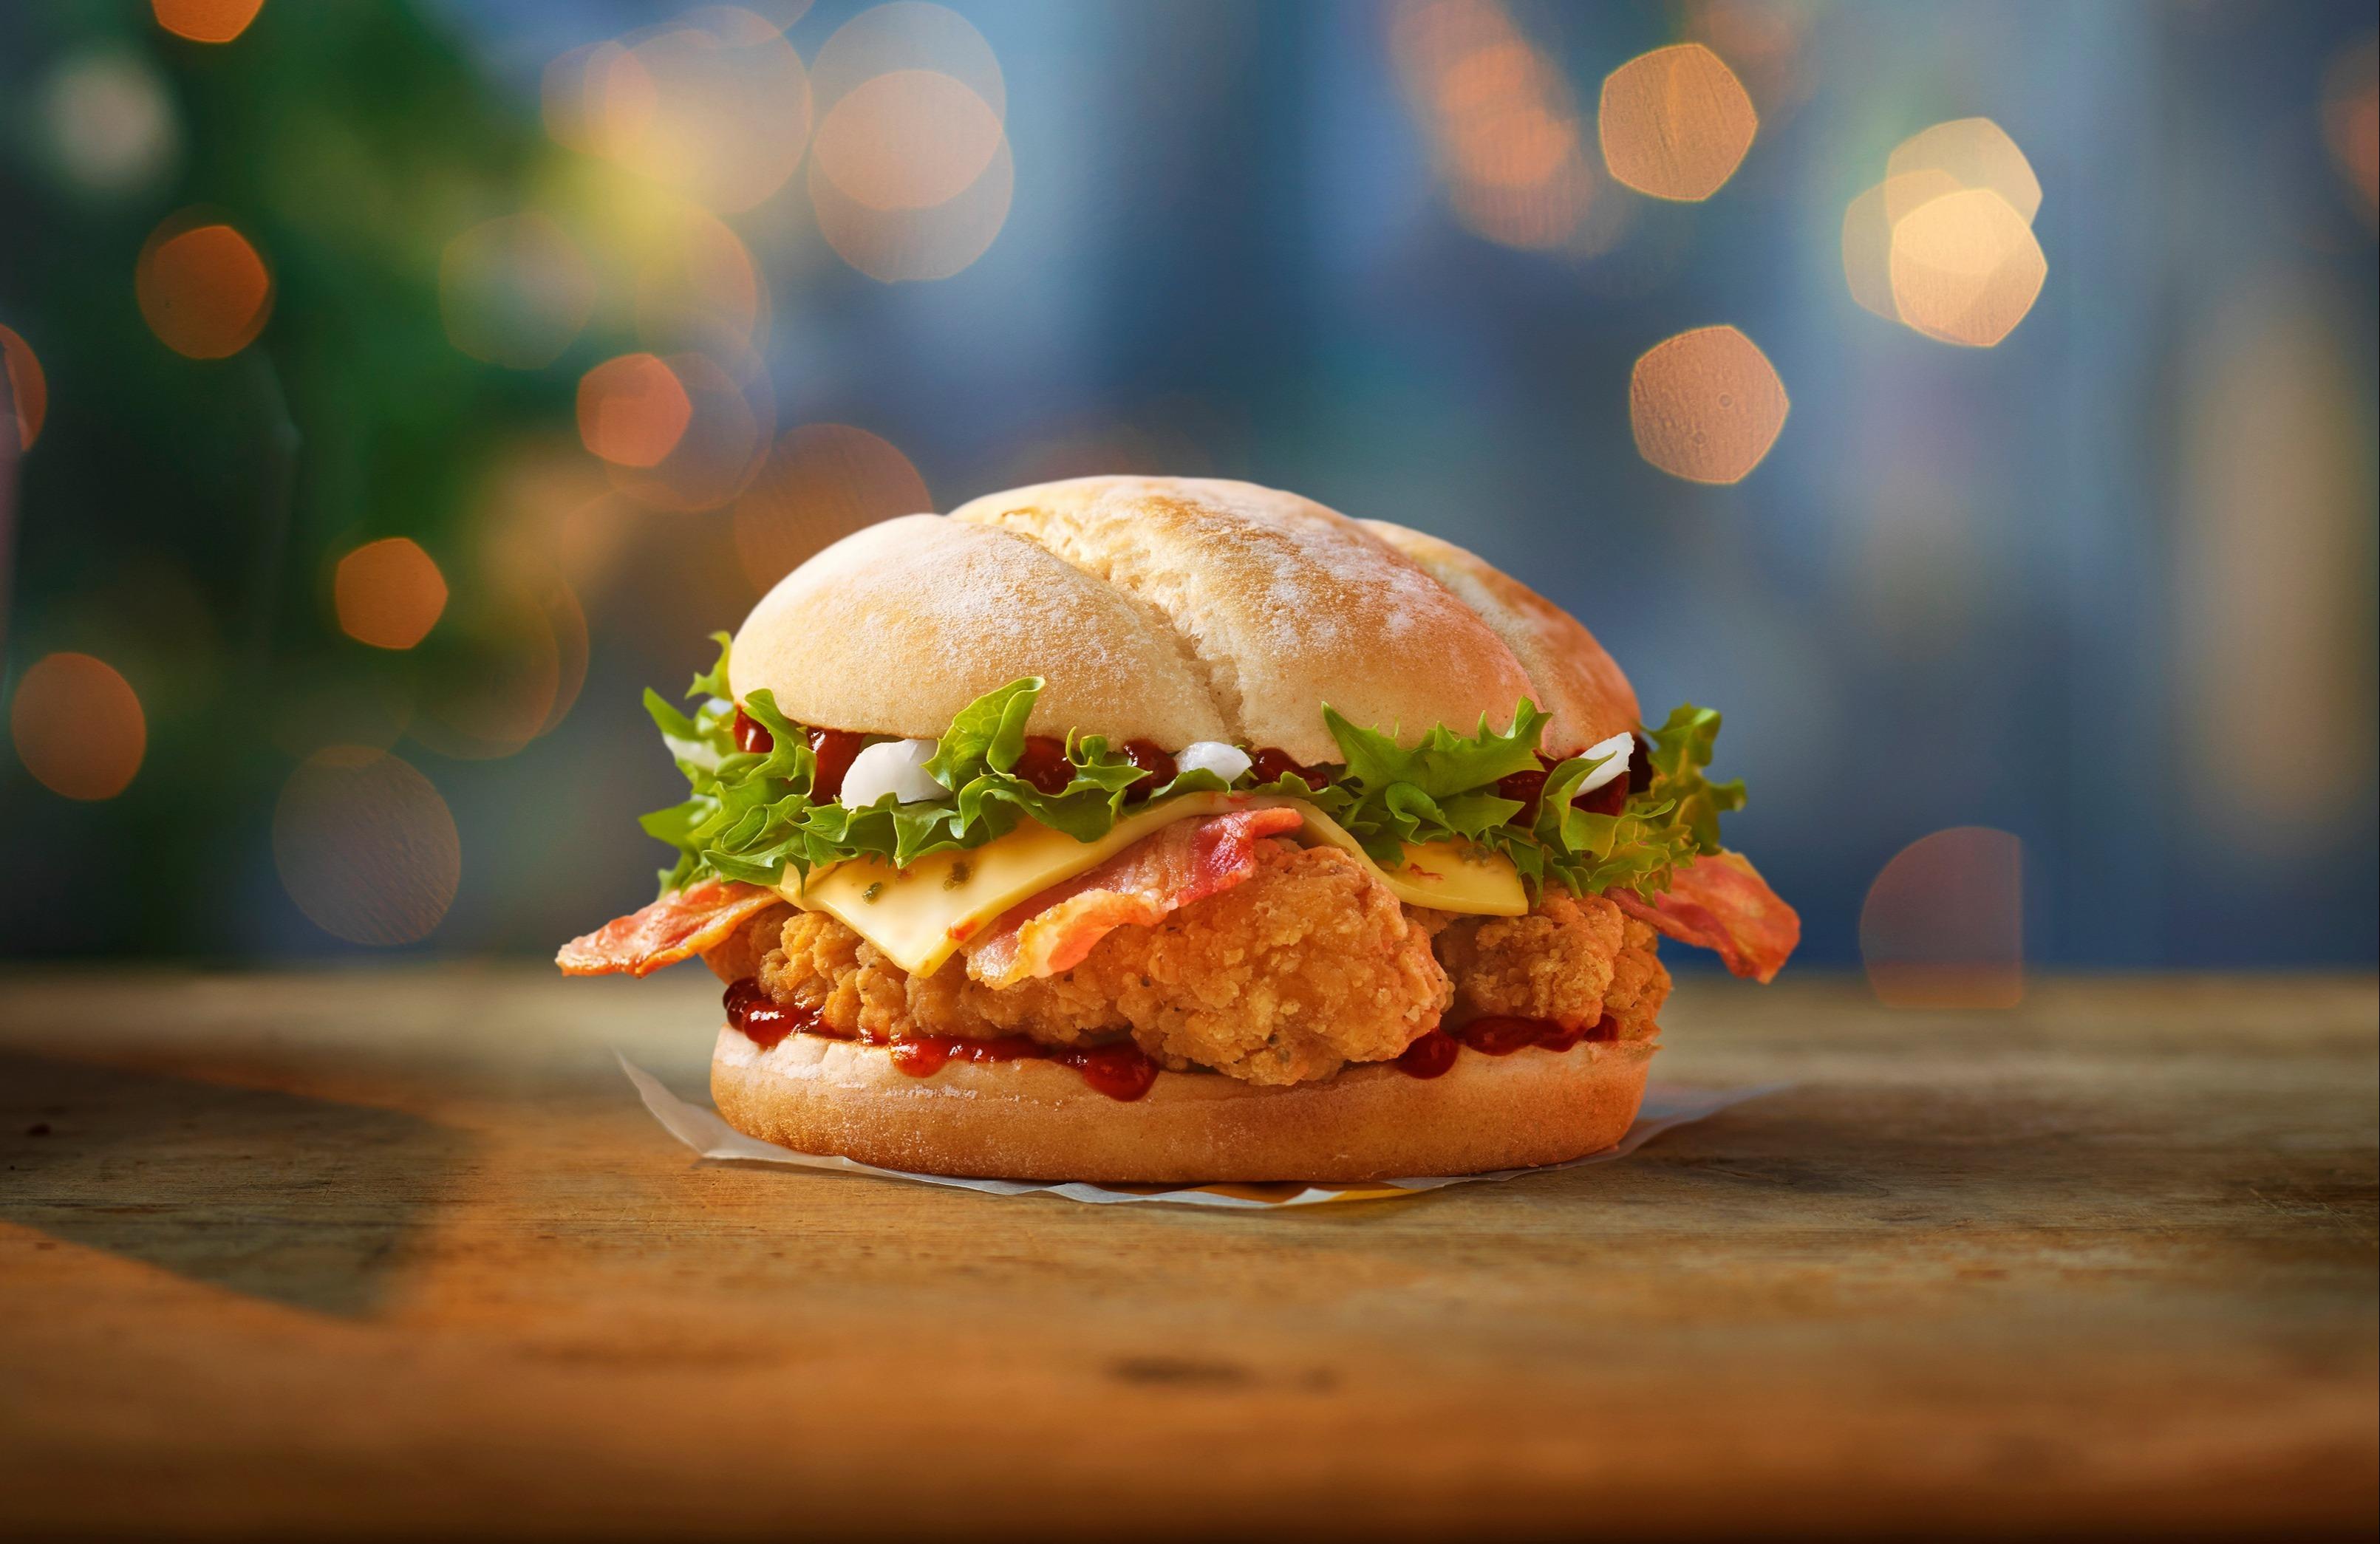 The new Jamaican jerk chicken sandwich features a spicy kick